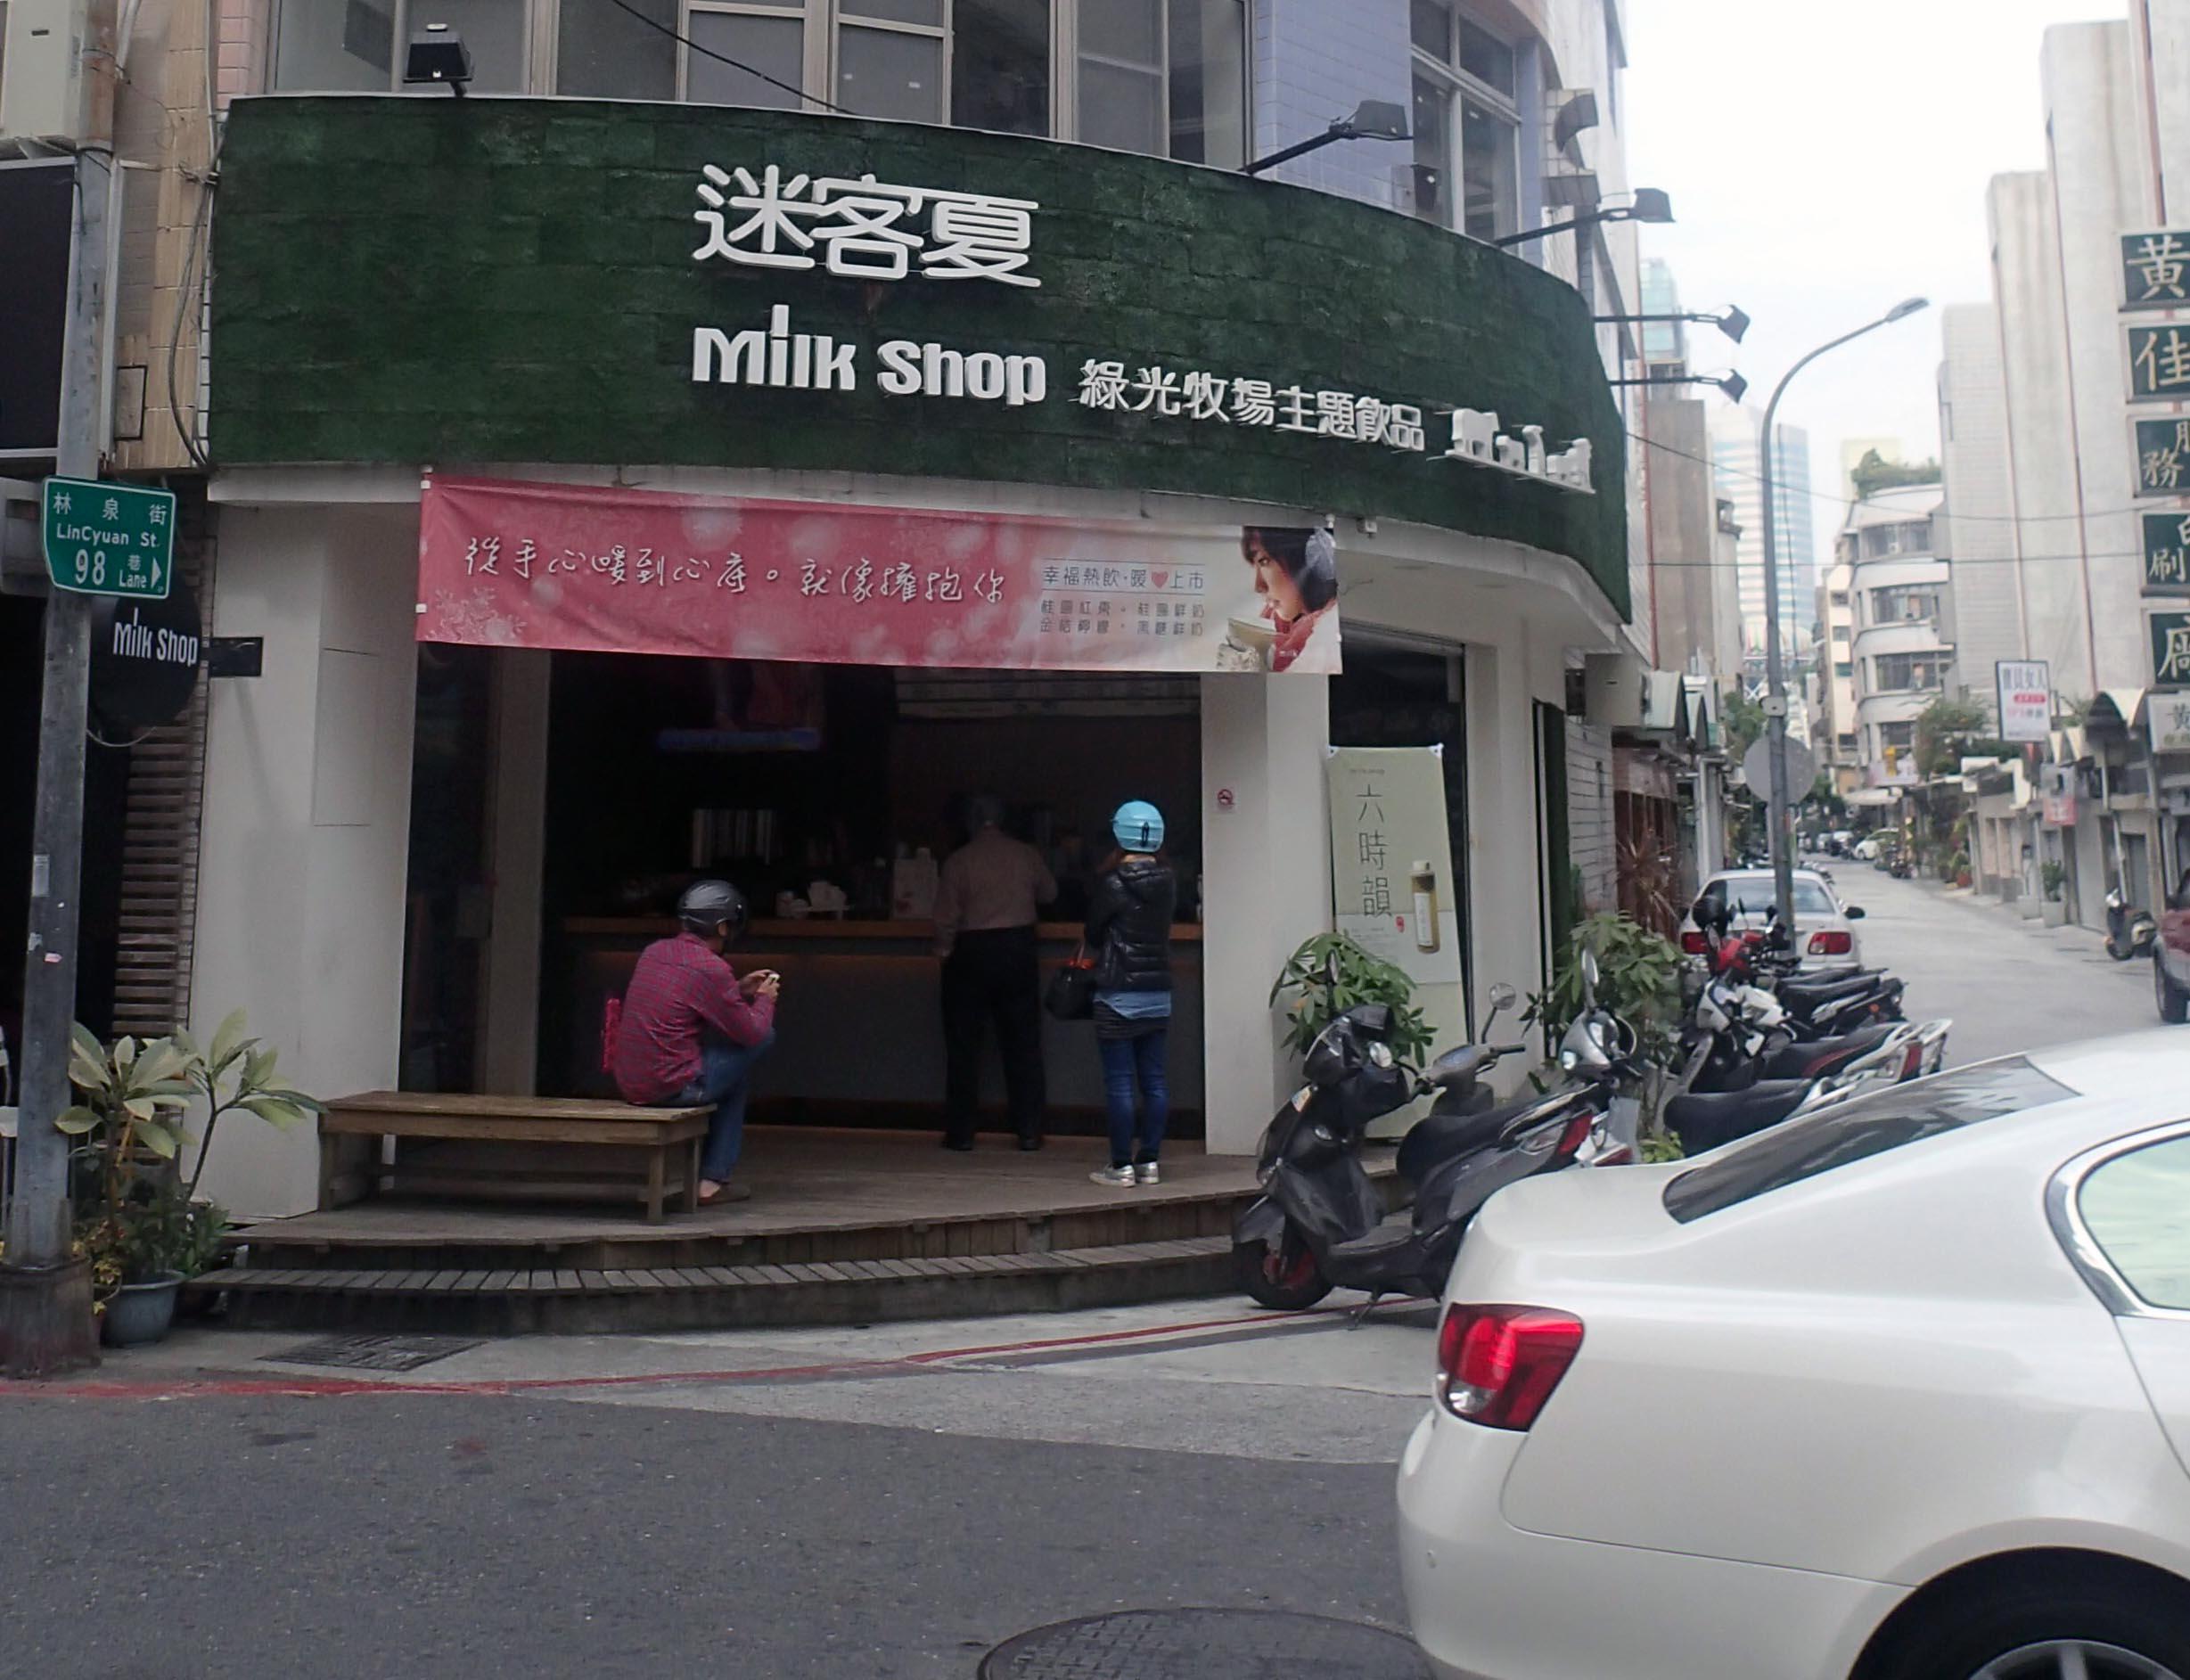 milk shop.jpg